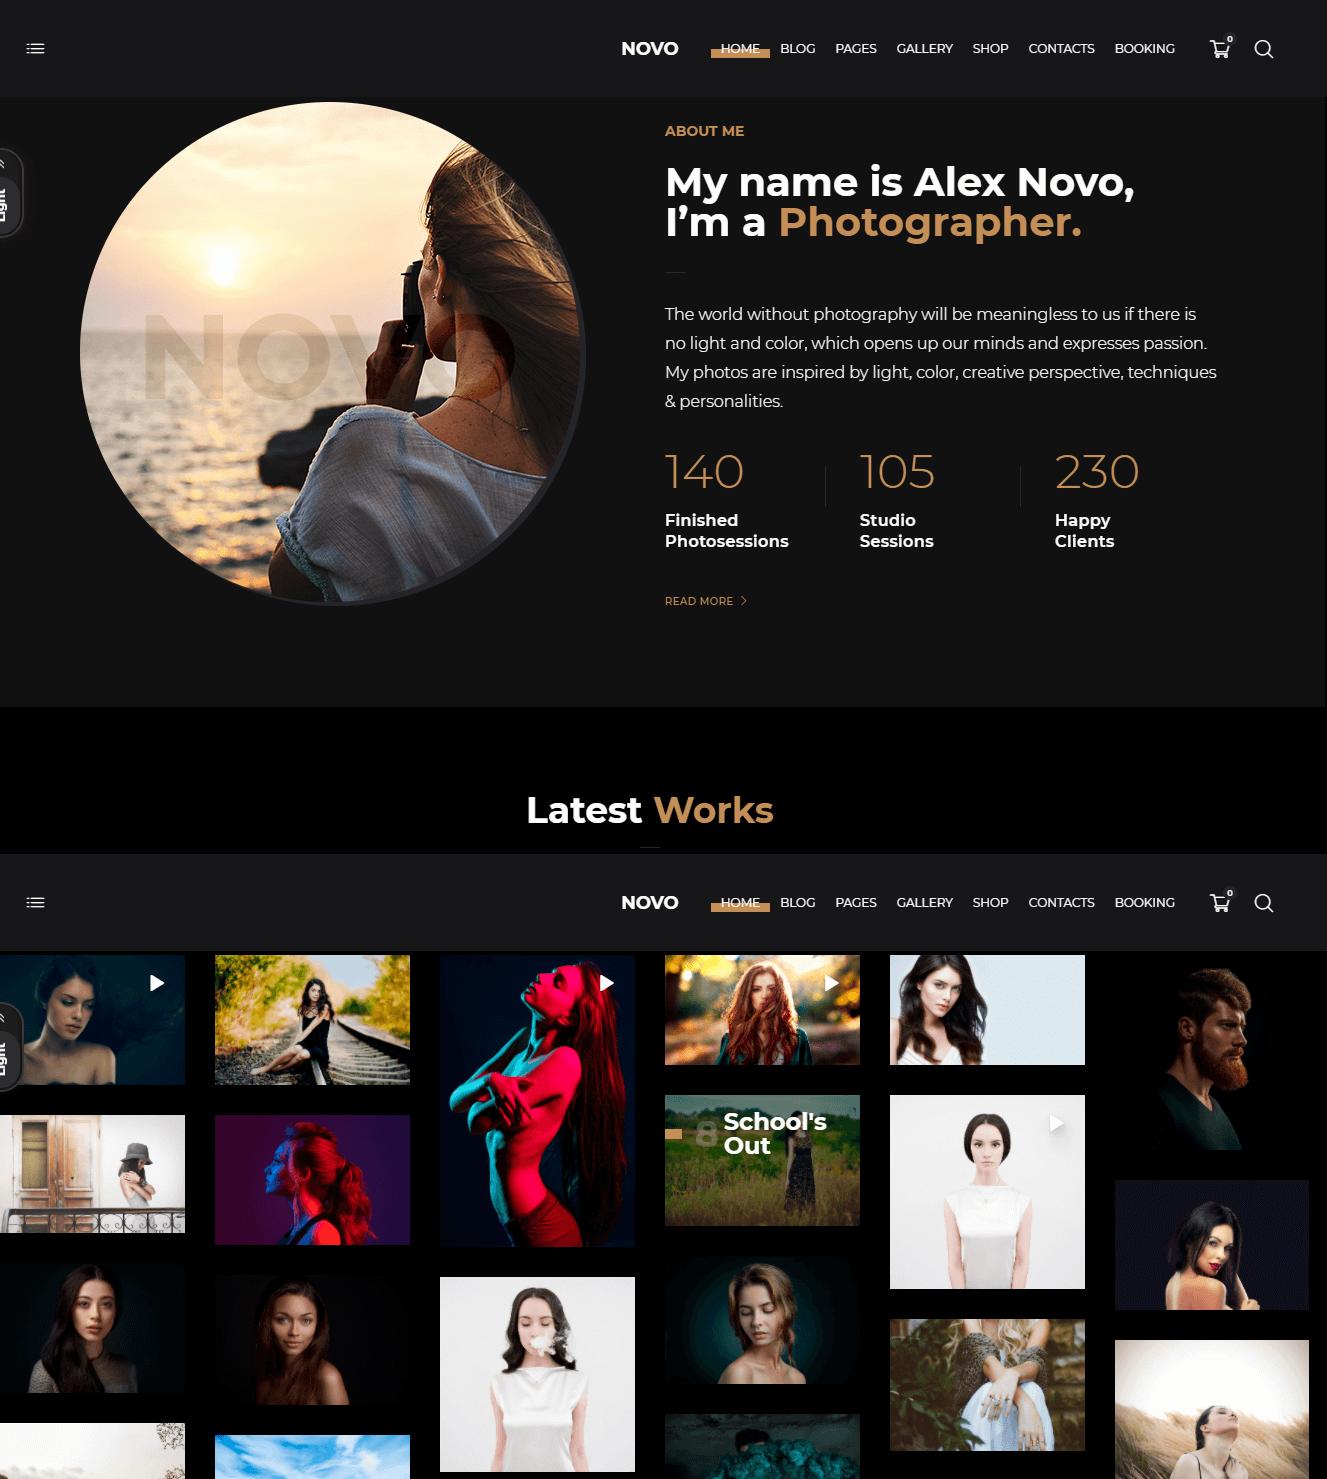 Novo-Photography-WordPress-Theme